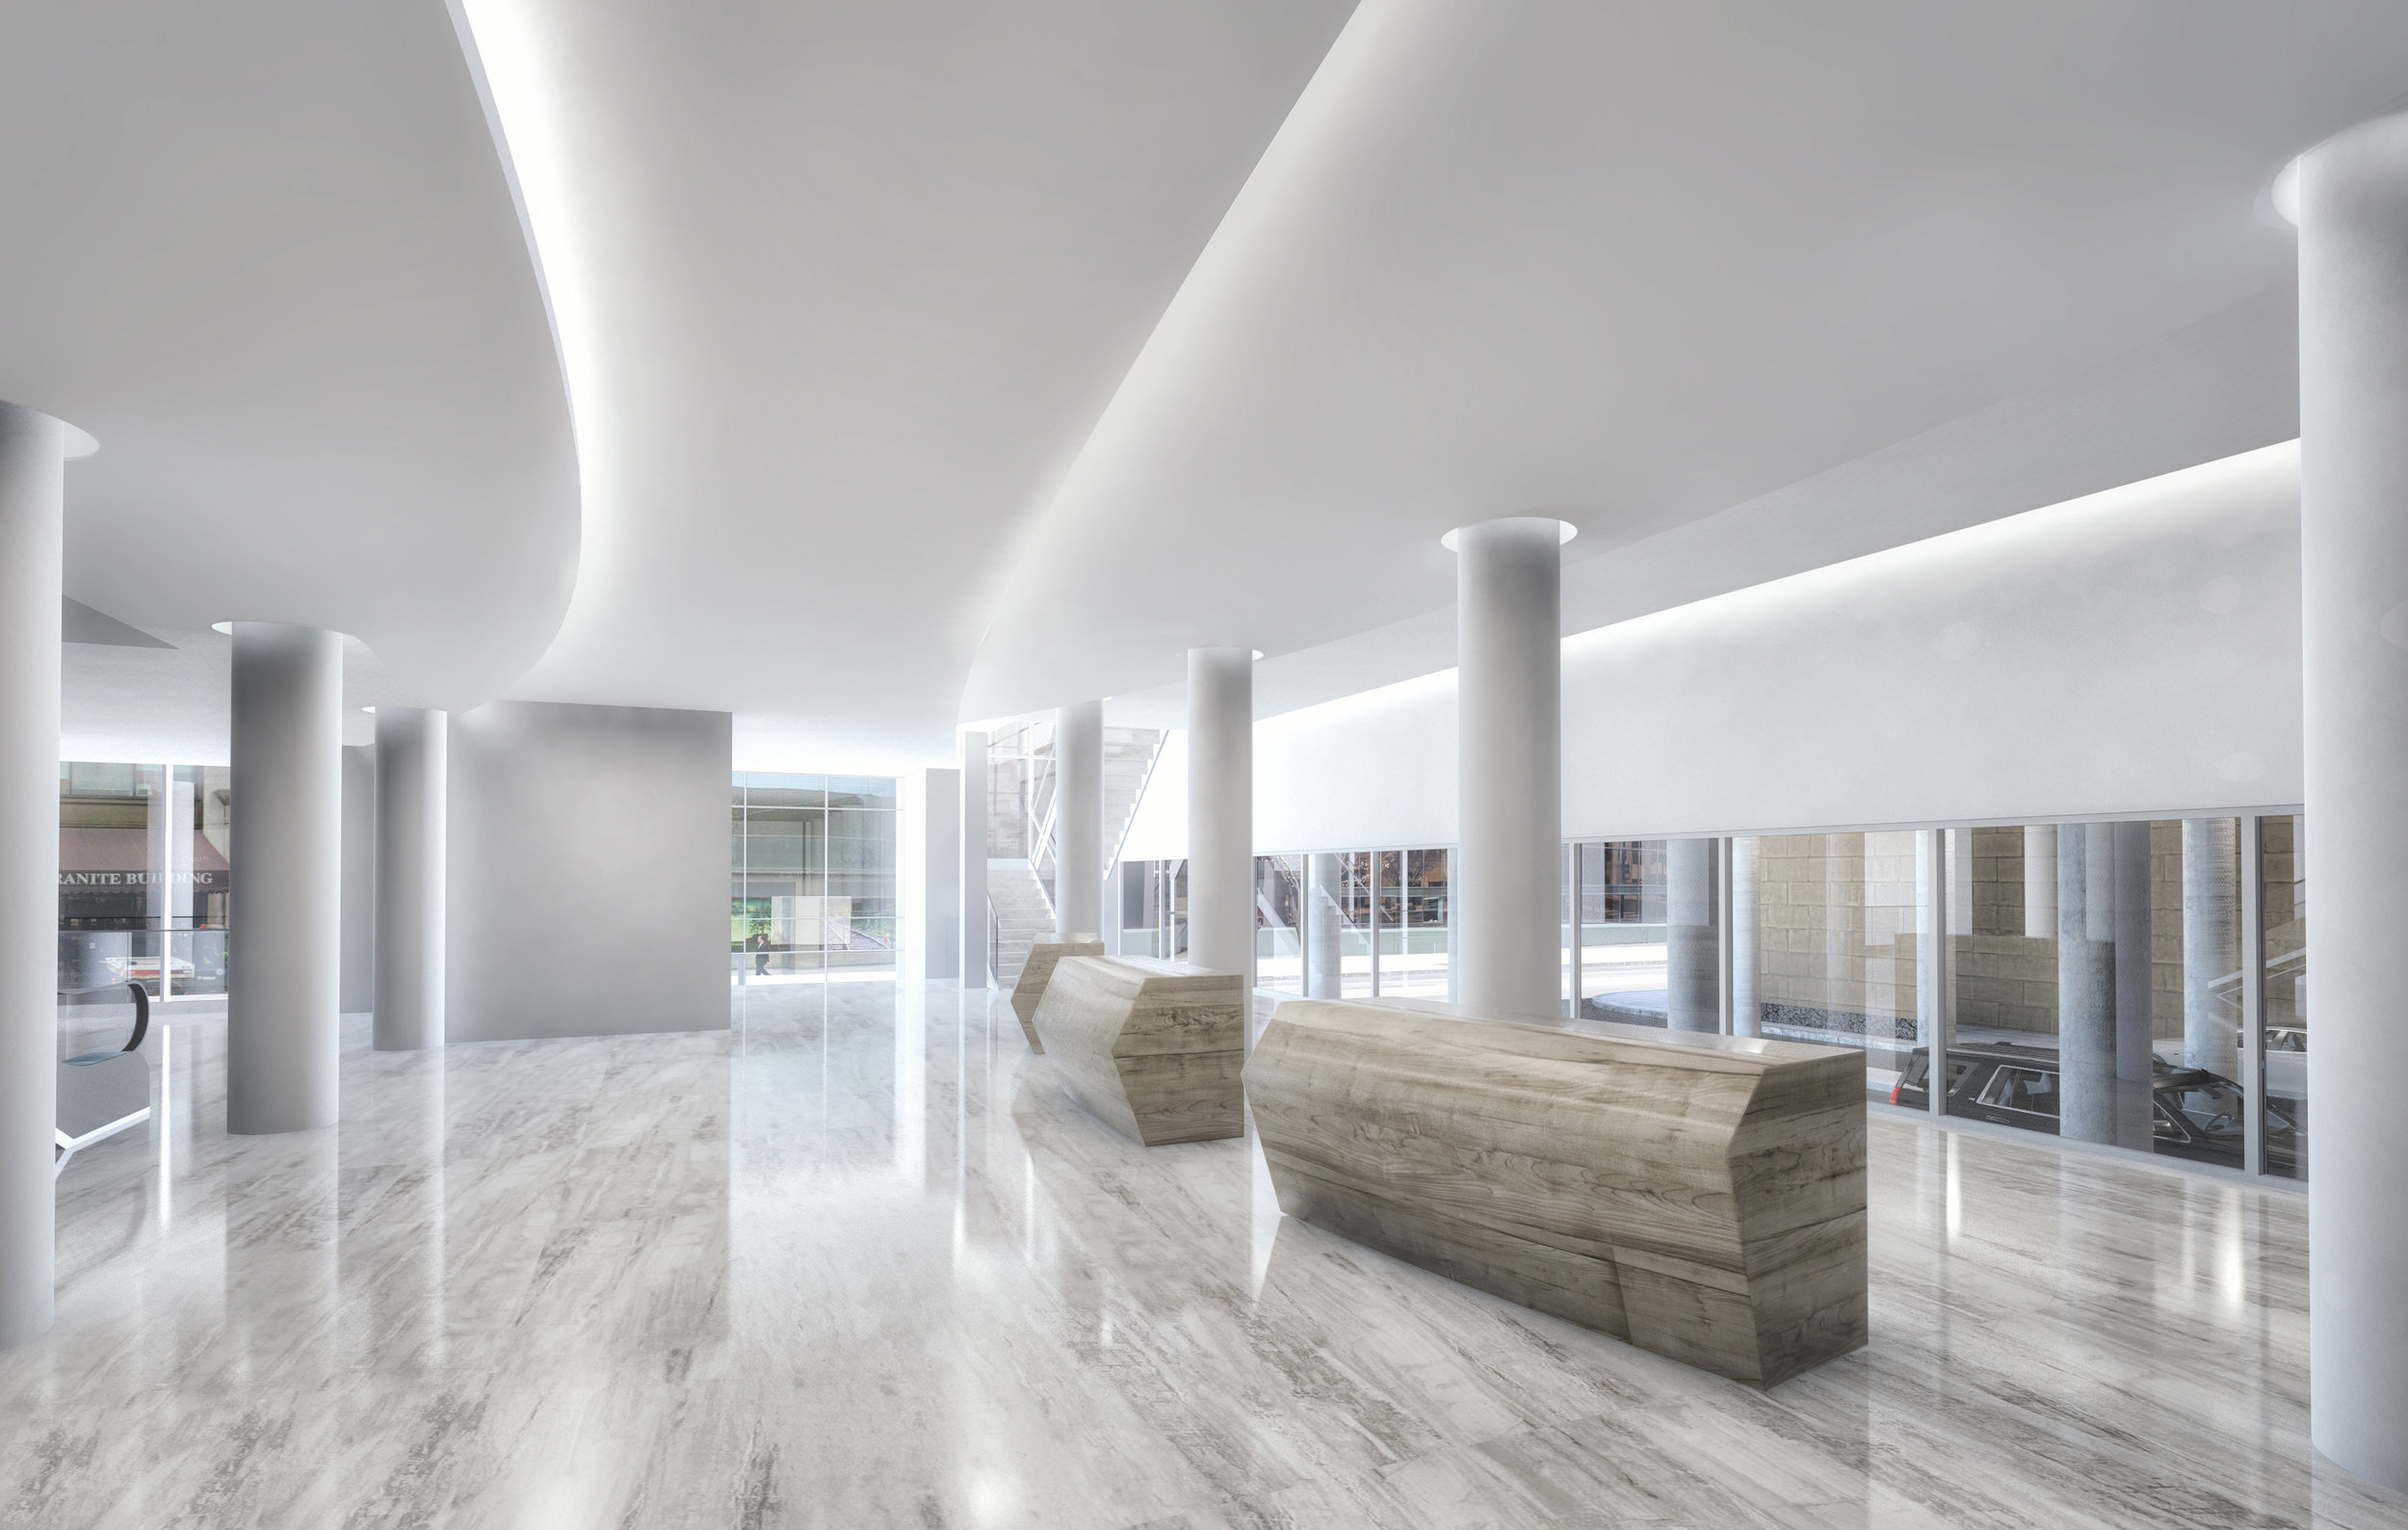 Rendering of New Lobby